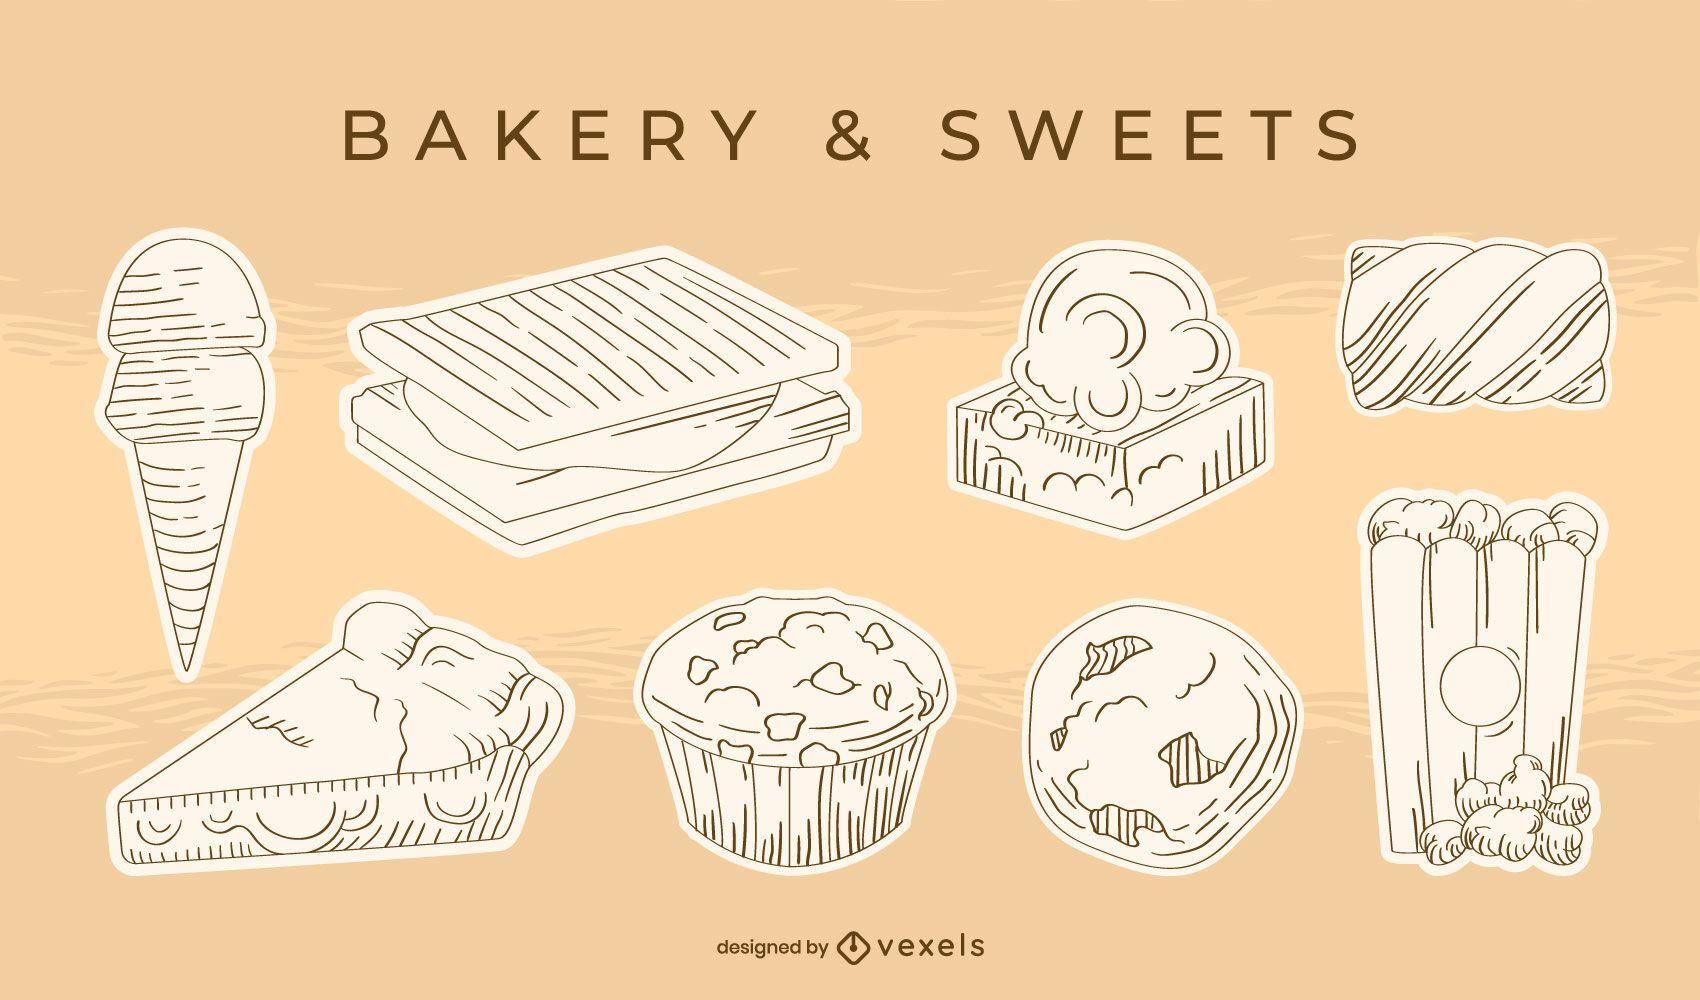 Sweet desserts hand-drawn set